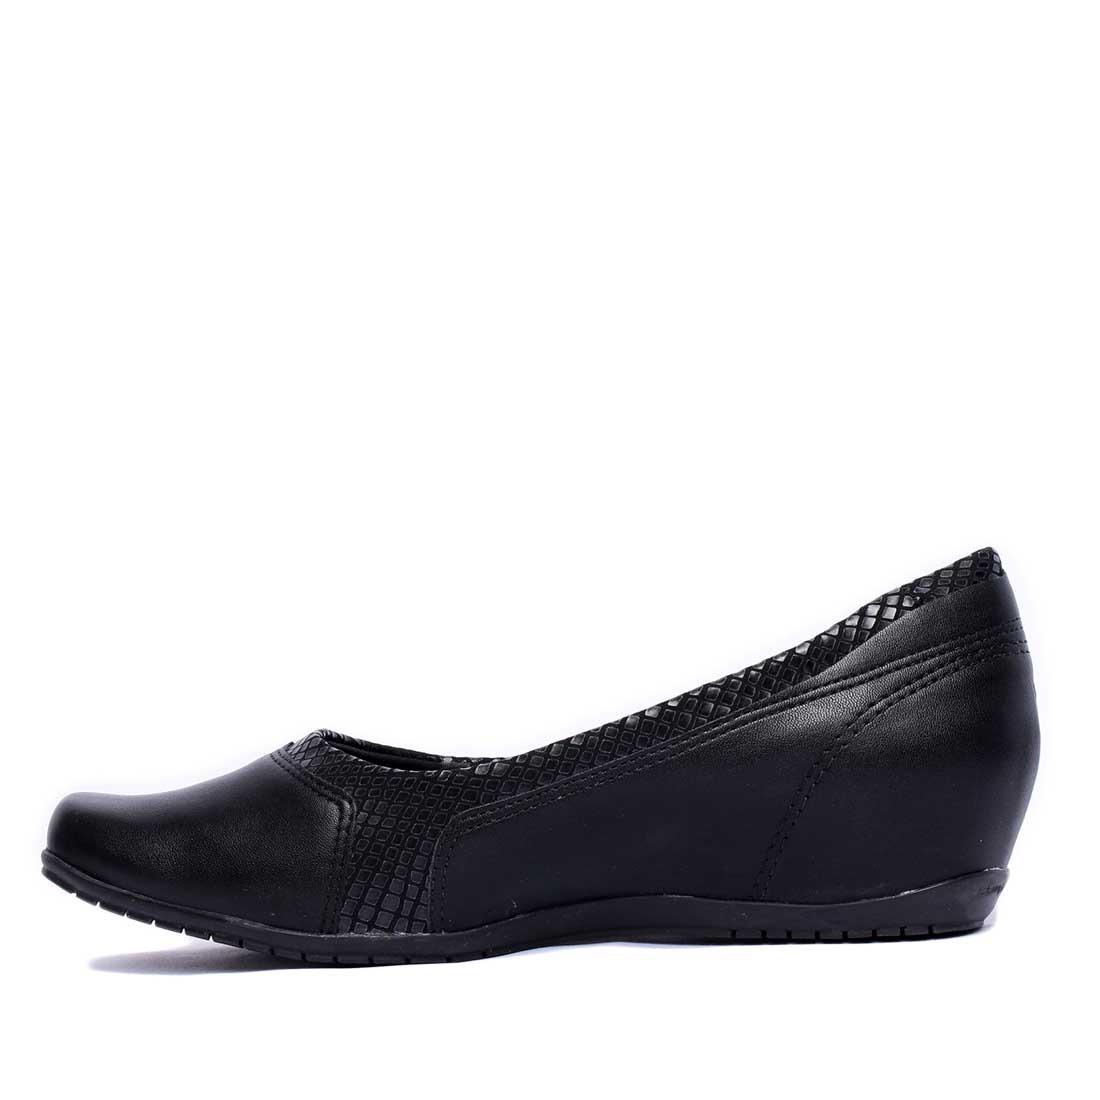 397c96da9 sapato feminino casual comfortflex flats ultrasoft. Carregando zoom... sapato  feminino comfortflex. Carregando zoom.